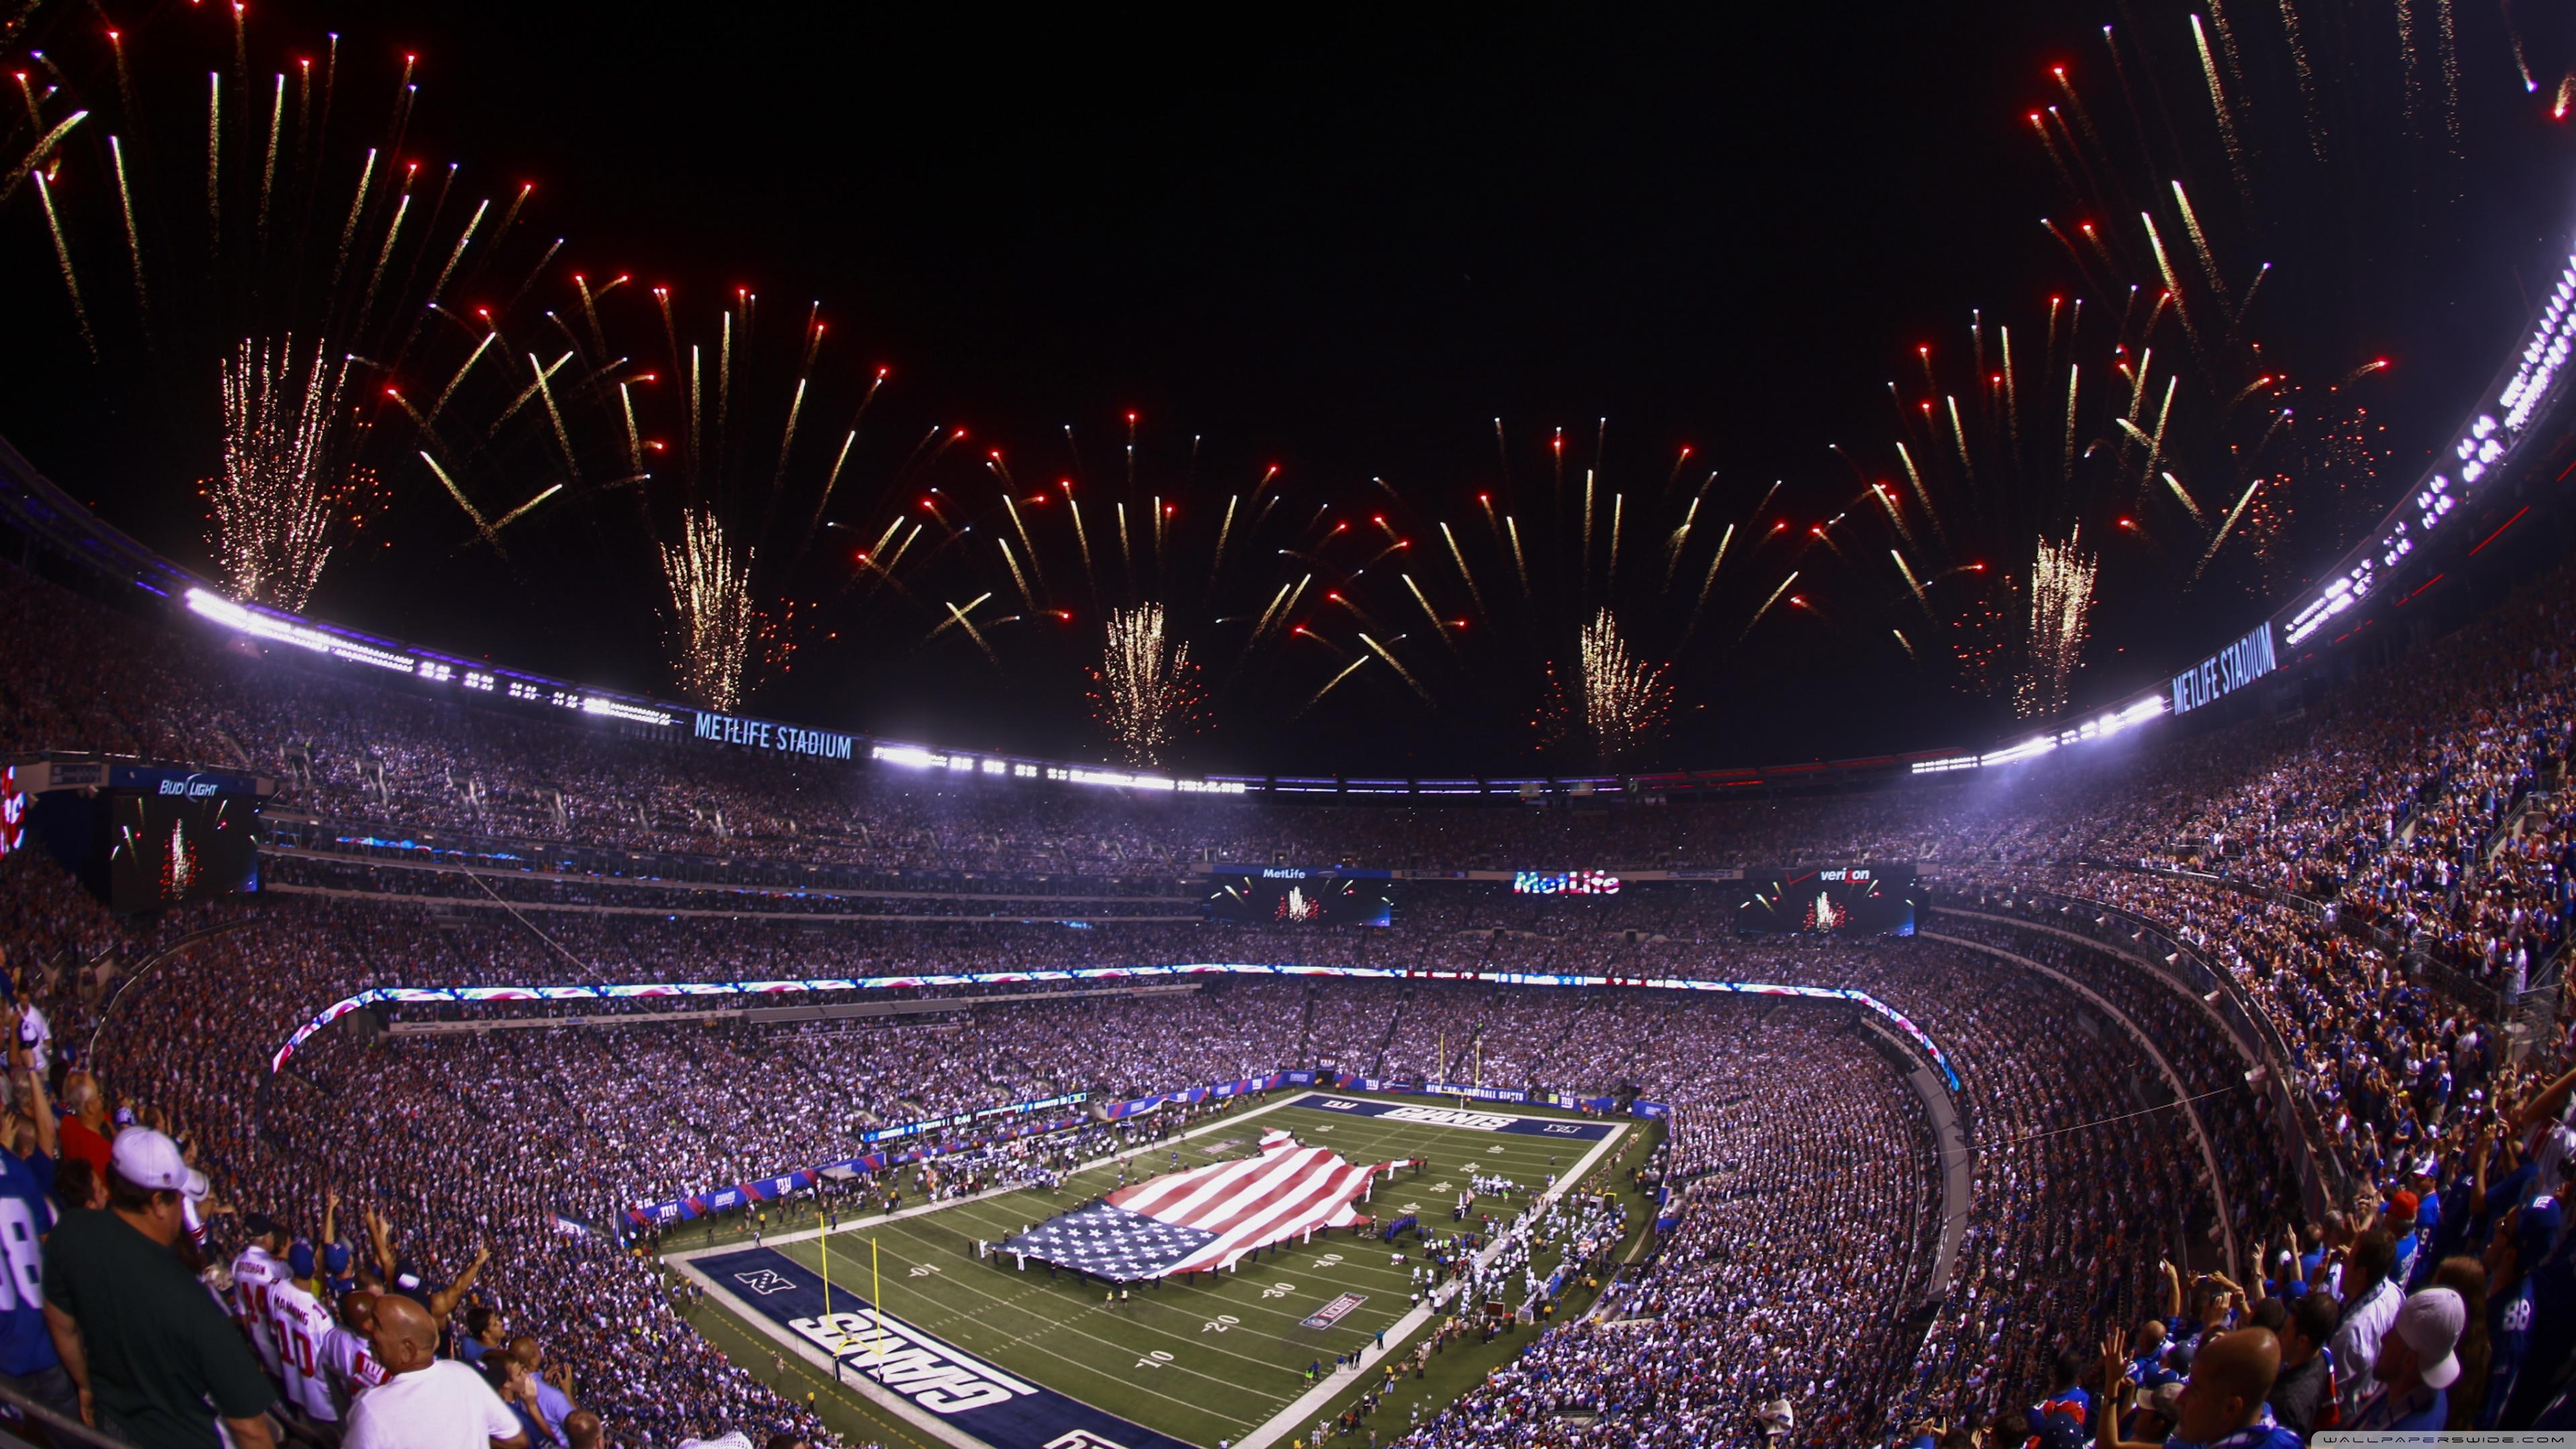 New York Giants 4k - HD Wallpaper